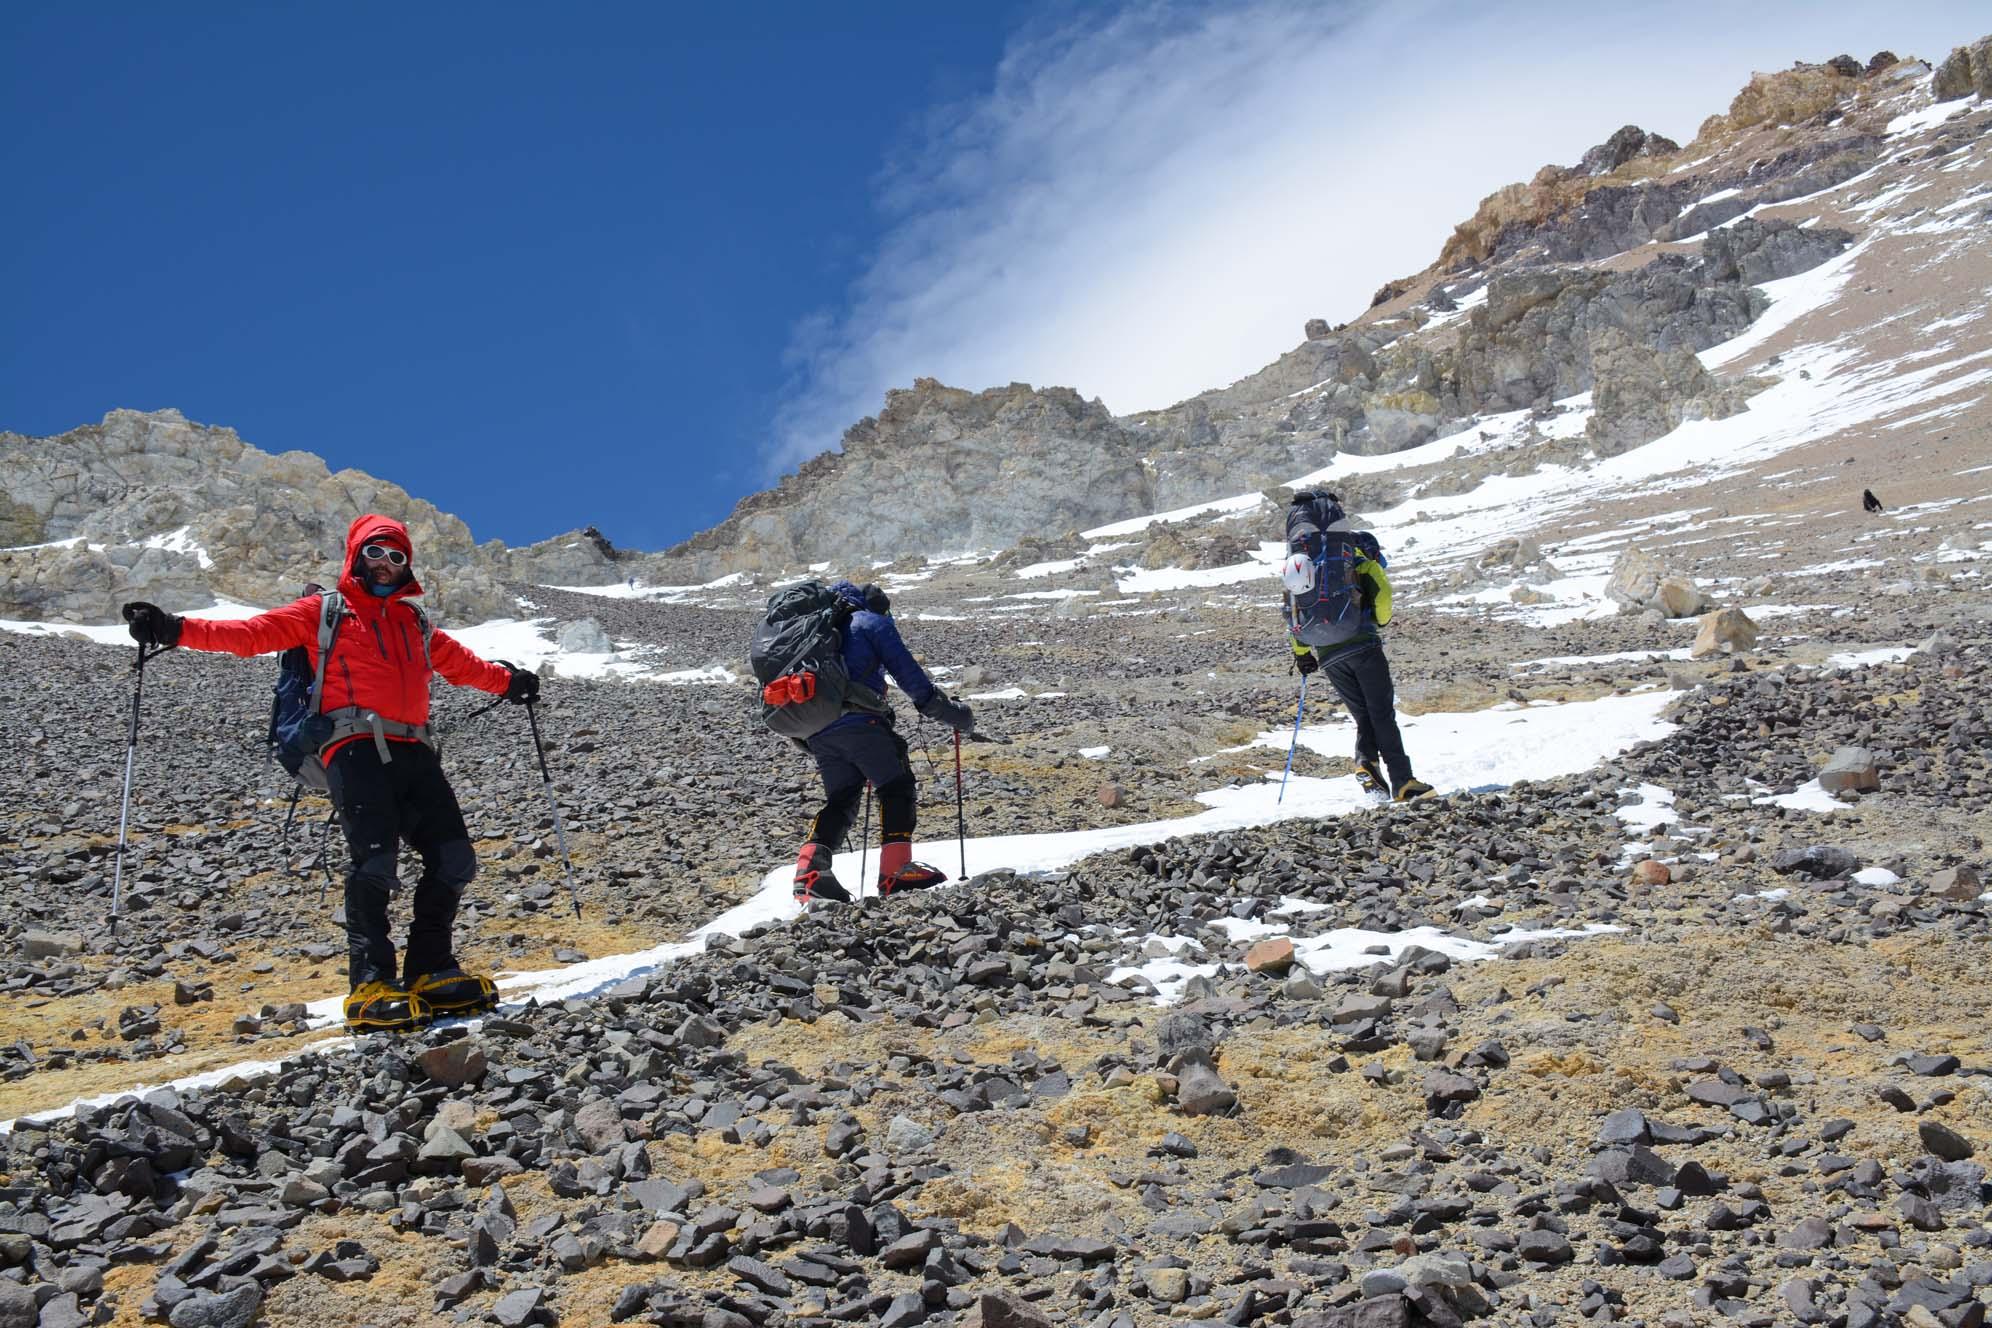 aconcagua summit of south america rucksack pocket summits